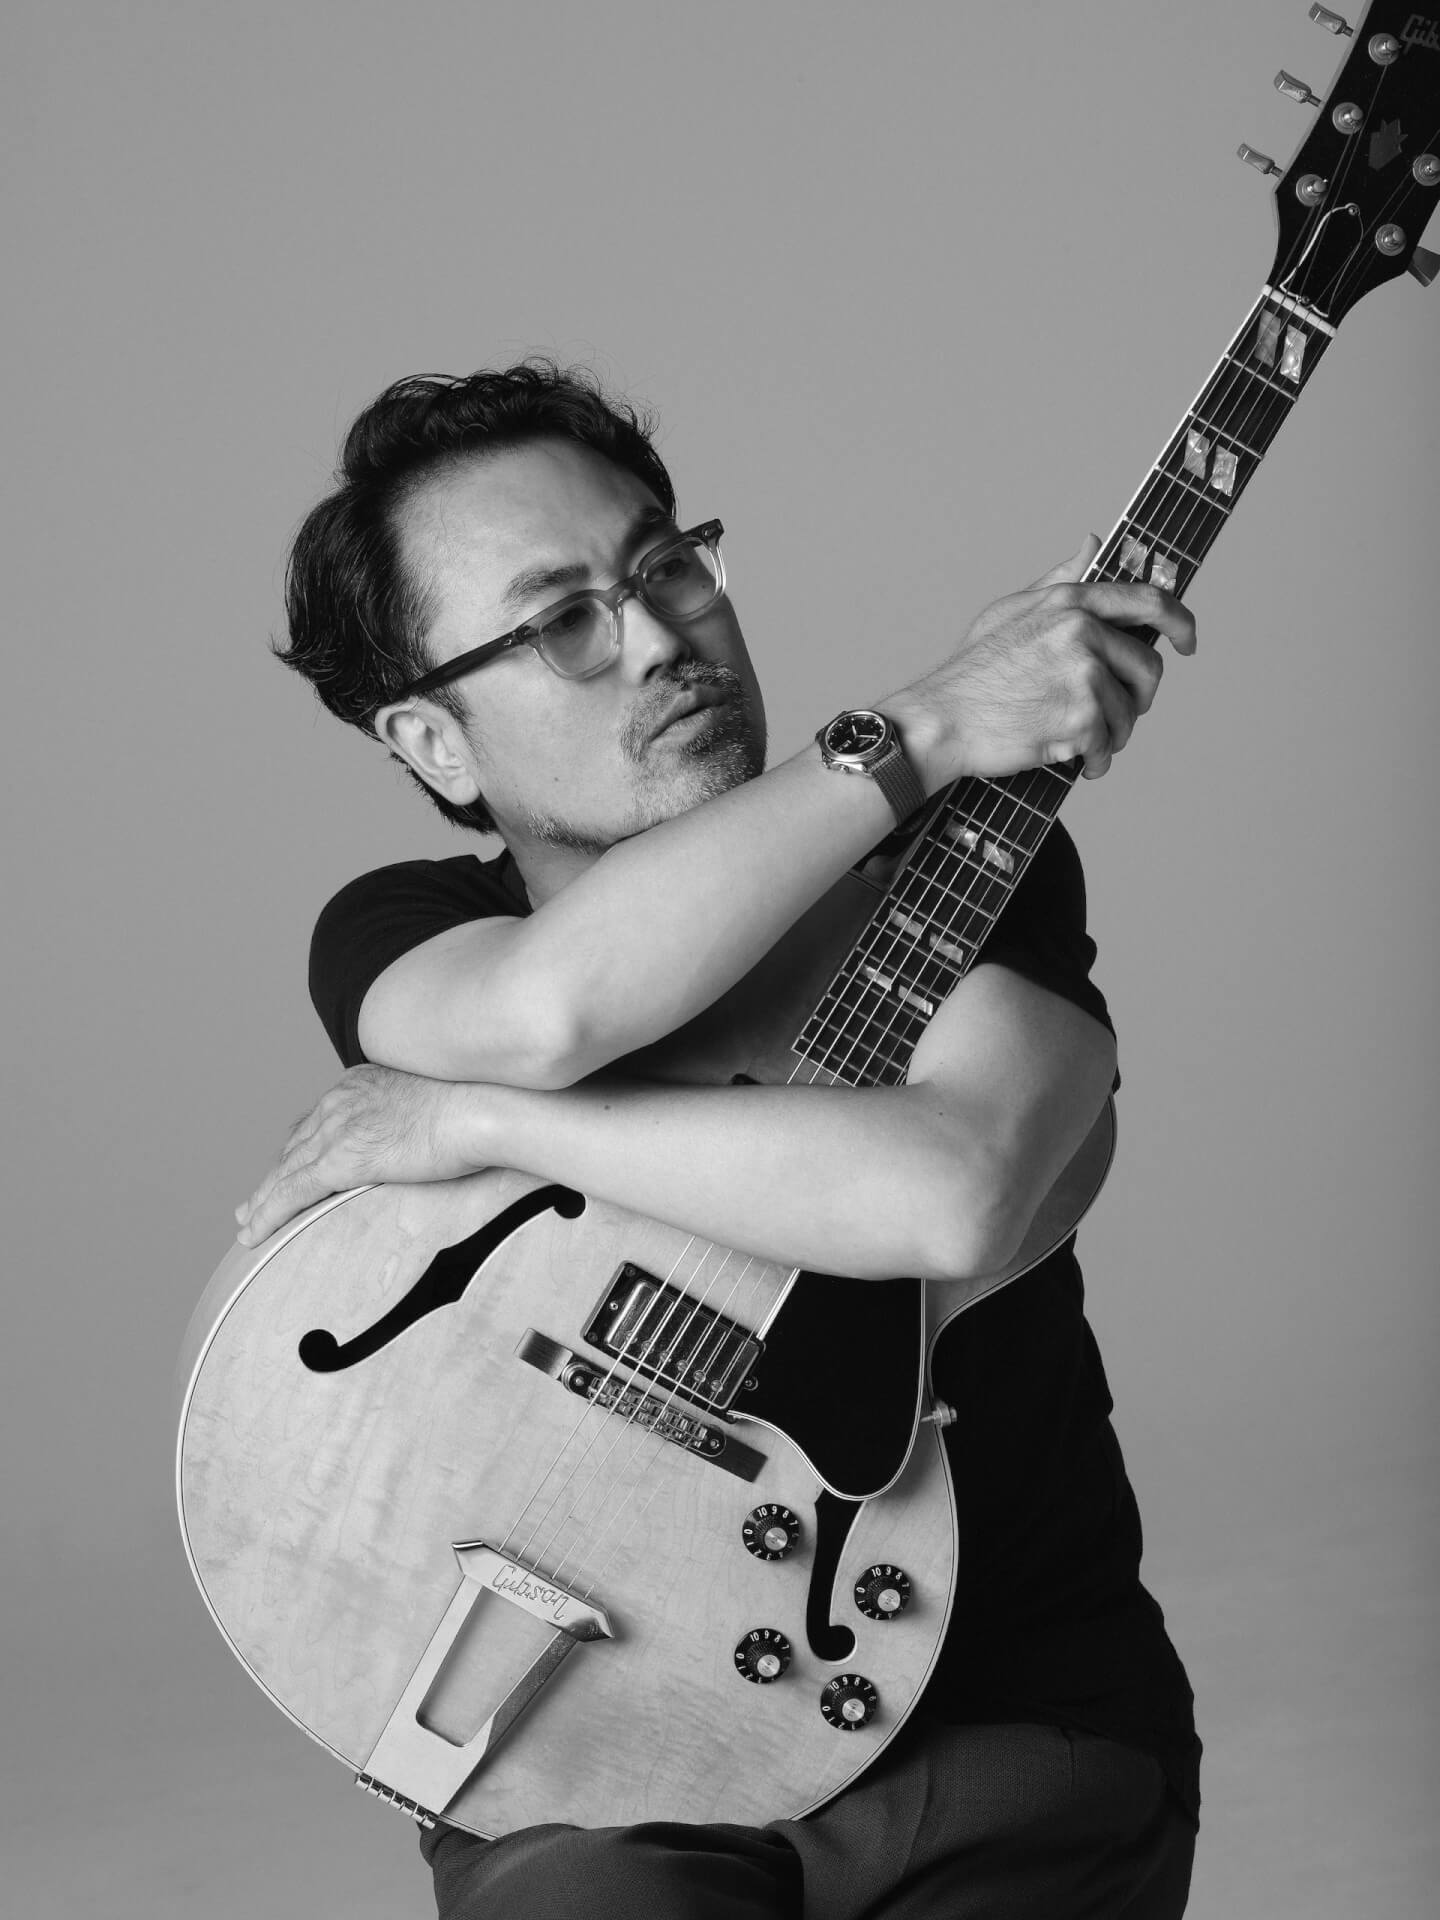 YOUR SONG IS GOODのGt吉澤成友初のソロ作『Guitar Esquisse Volume One』がリリース決定! music_210721_masatoyoshizawa3